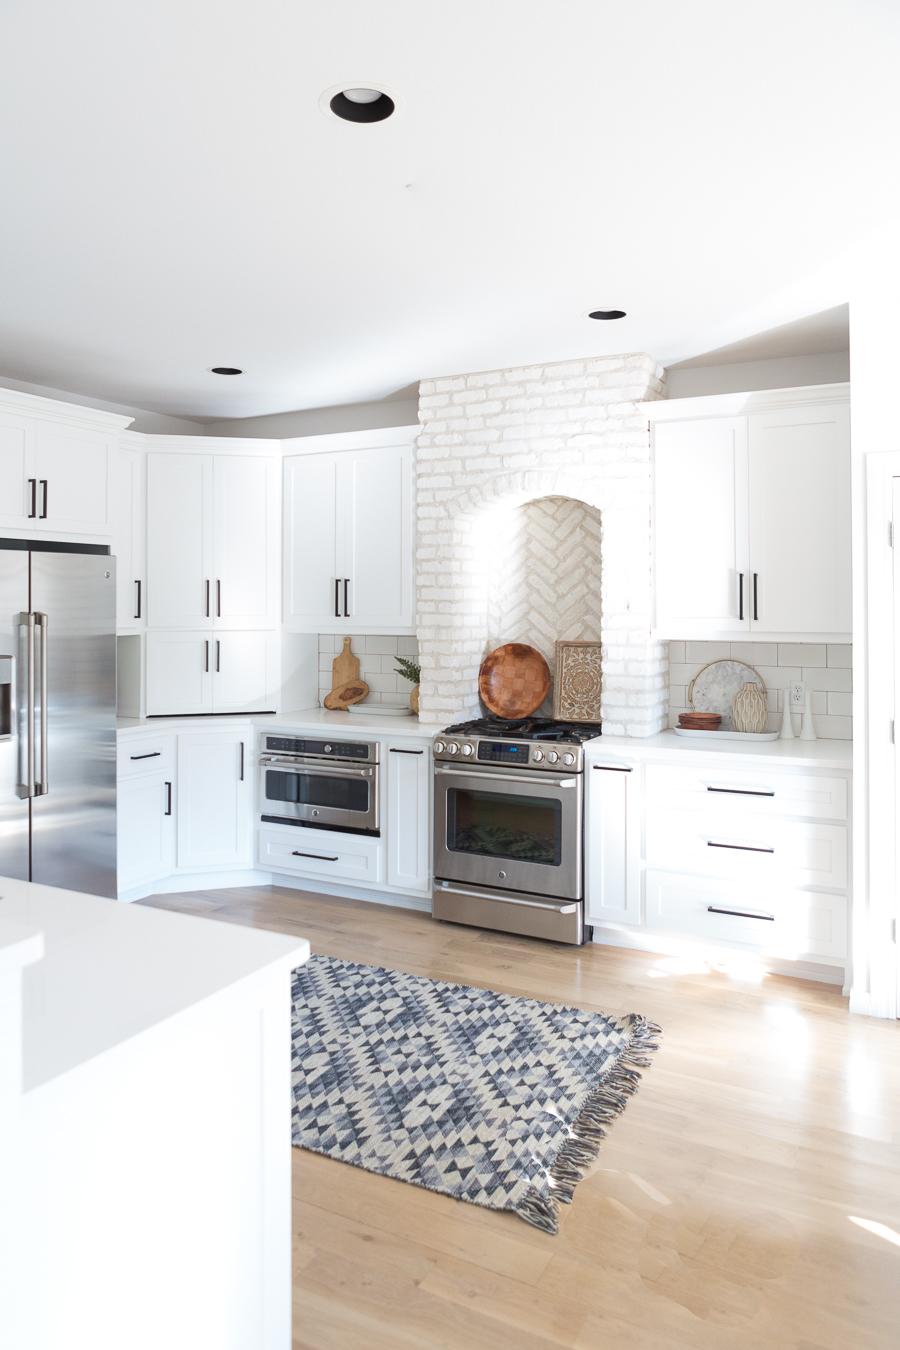 Tulsa Remodel Reveal Modern White Farmhouse Black Windows And Doors White Brick Kitchen Black Hardware 1 Cc Mike